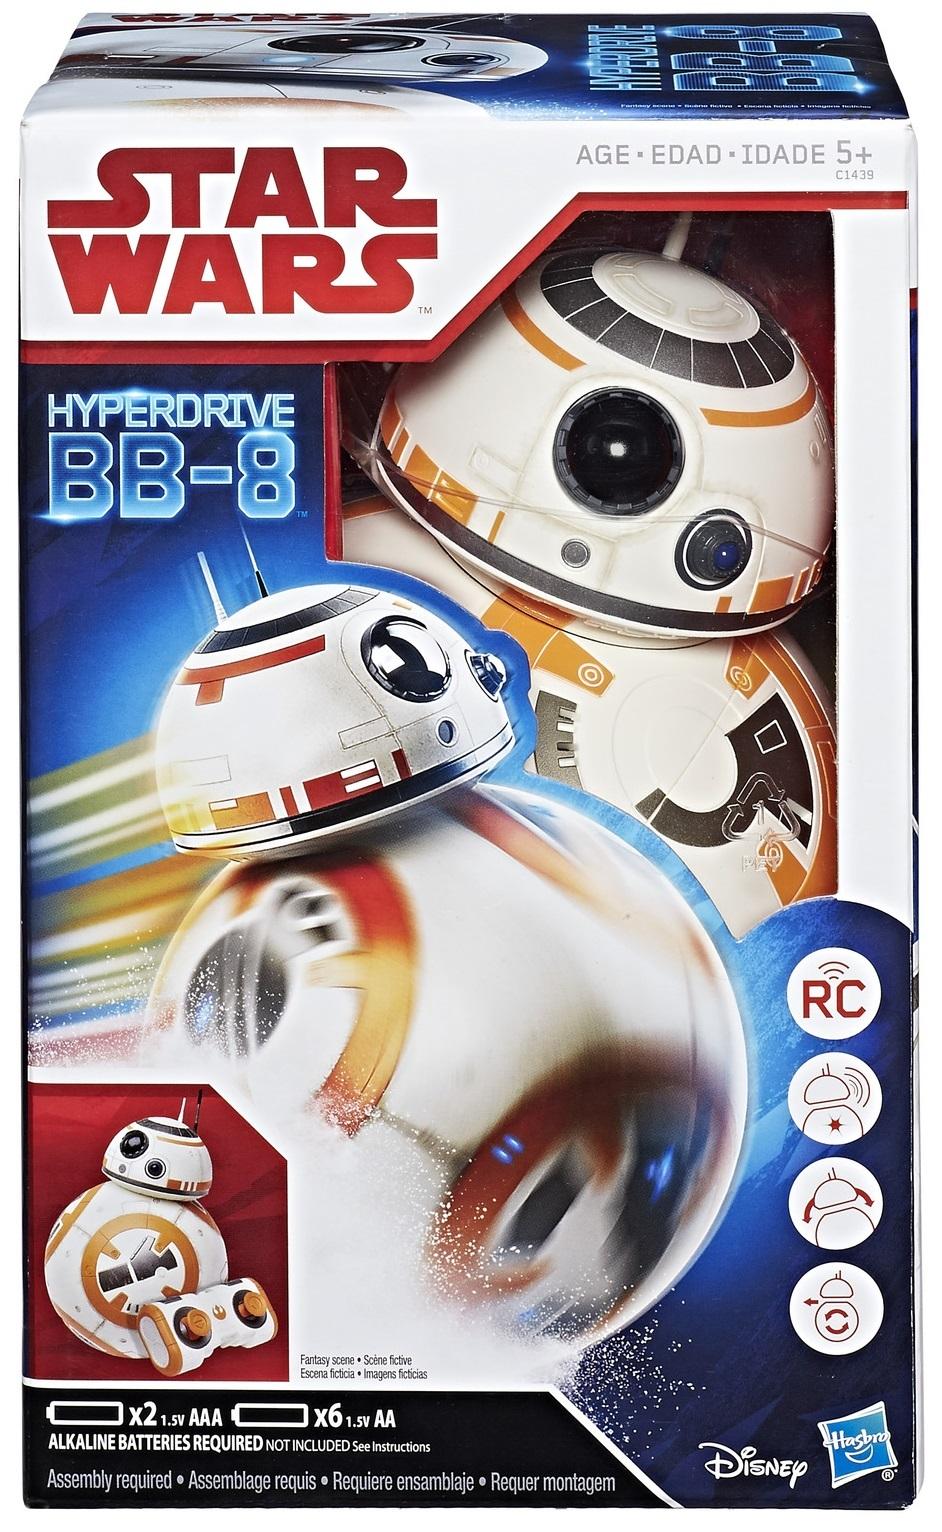 Star Wars: Hyperdrive BB-8 image